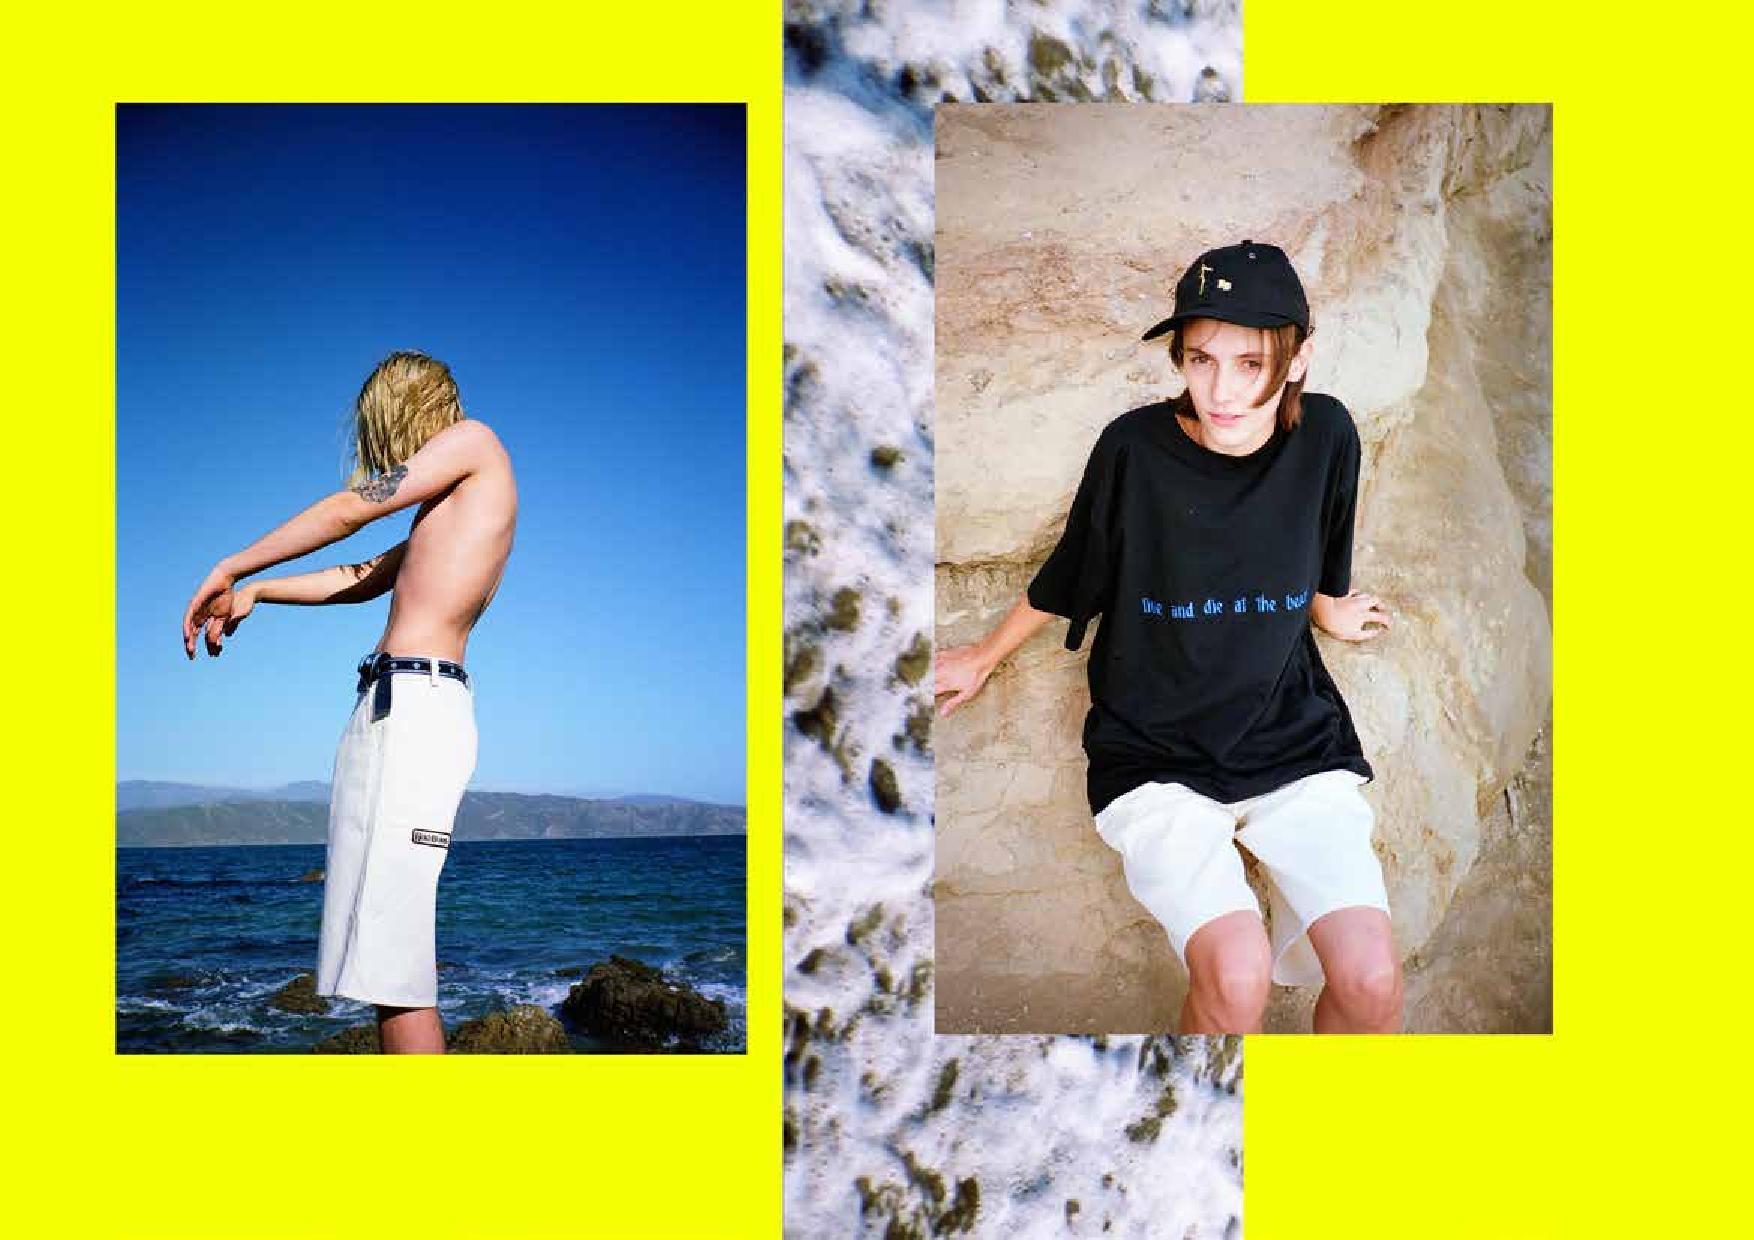 BeachBrains-page-006